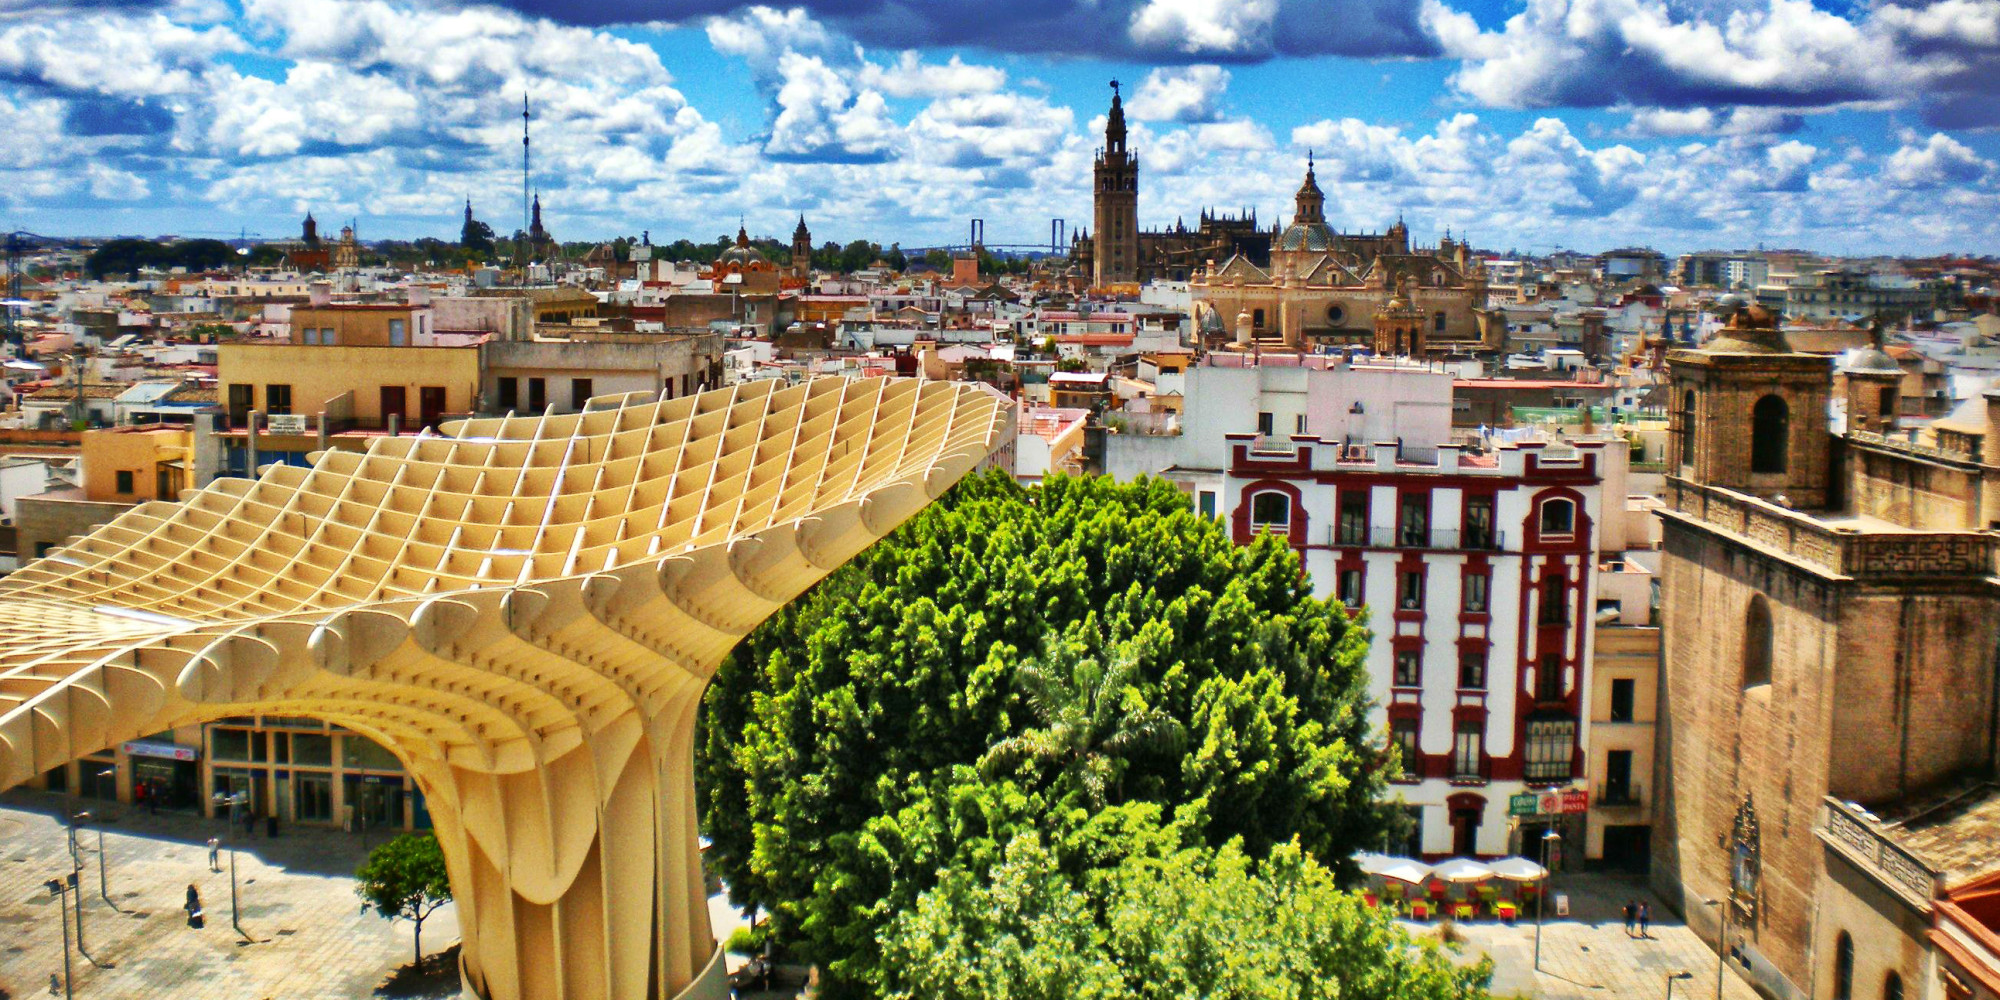 Ocho joyas de la arquitectura moderna en espa a fotos for Arquitectura de espana